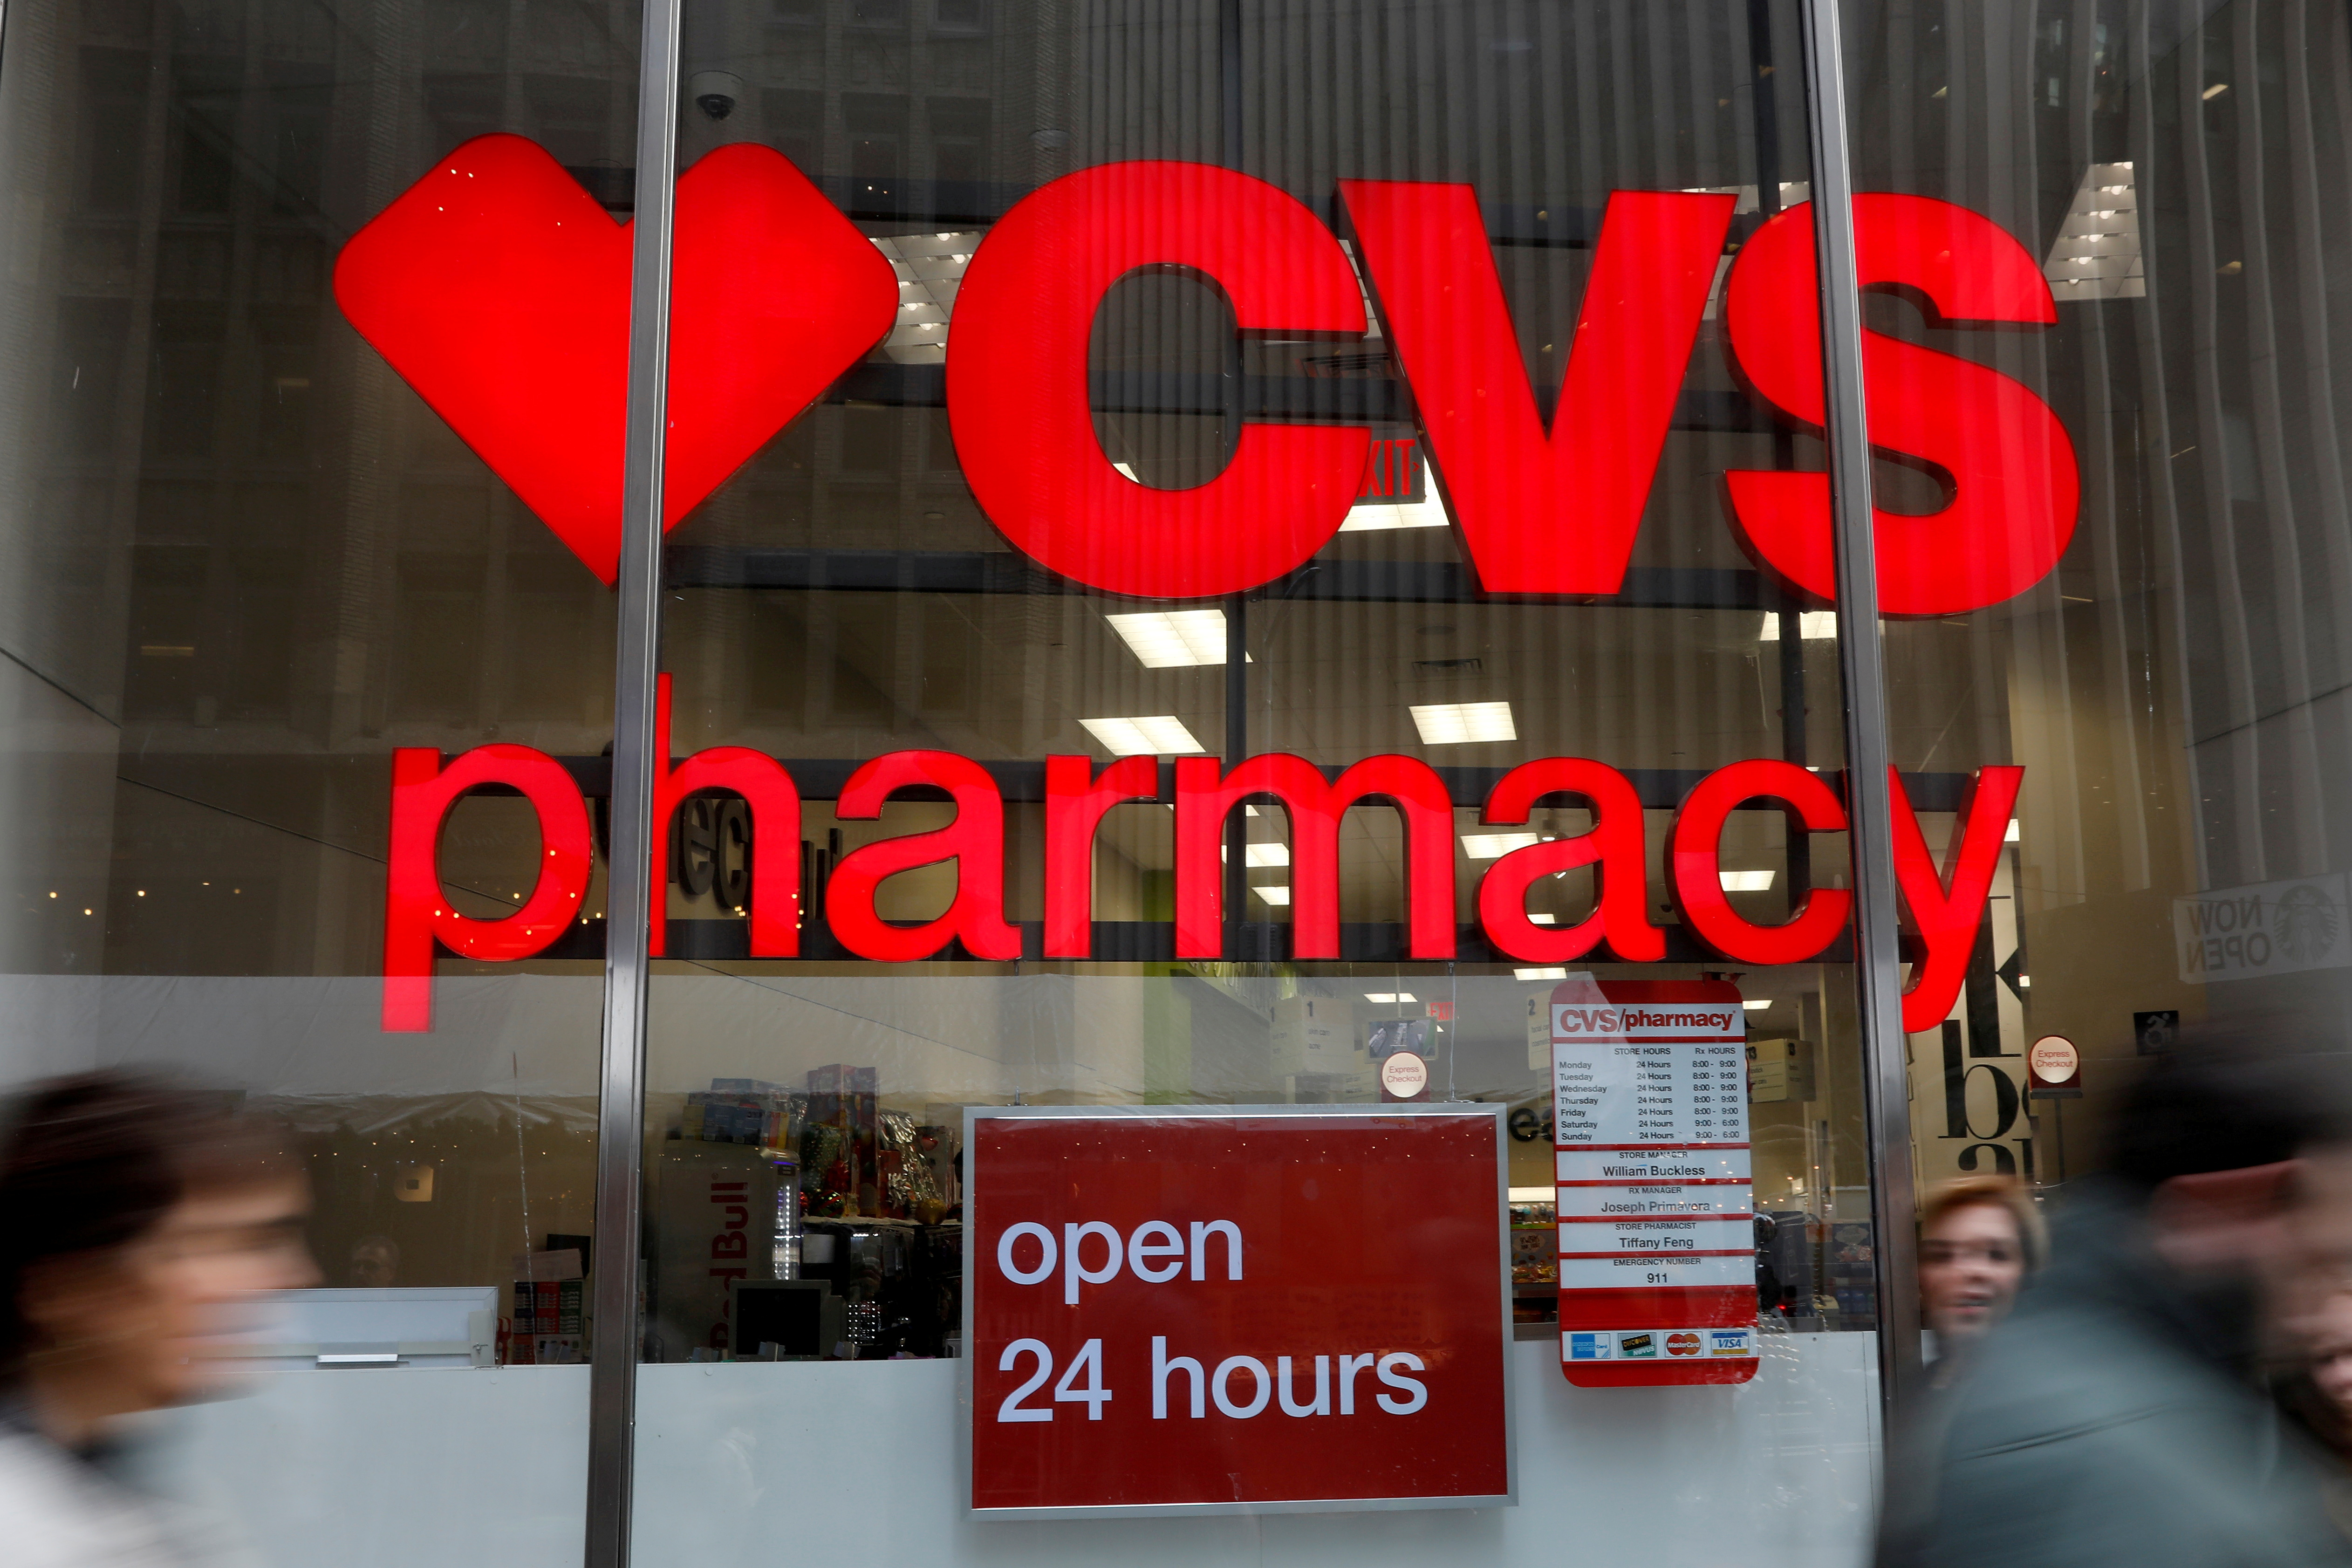 People walk by a CVS Pharmacy store in the Manhattan borough of New York City, New York, U.S., November 30, 2017. REUTERS/Shannon Stapleton